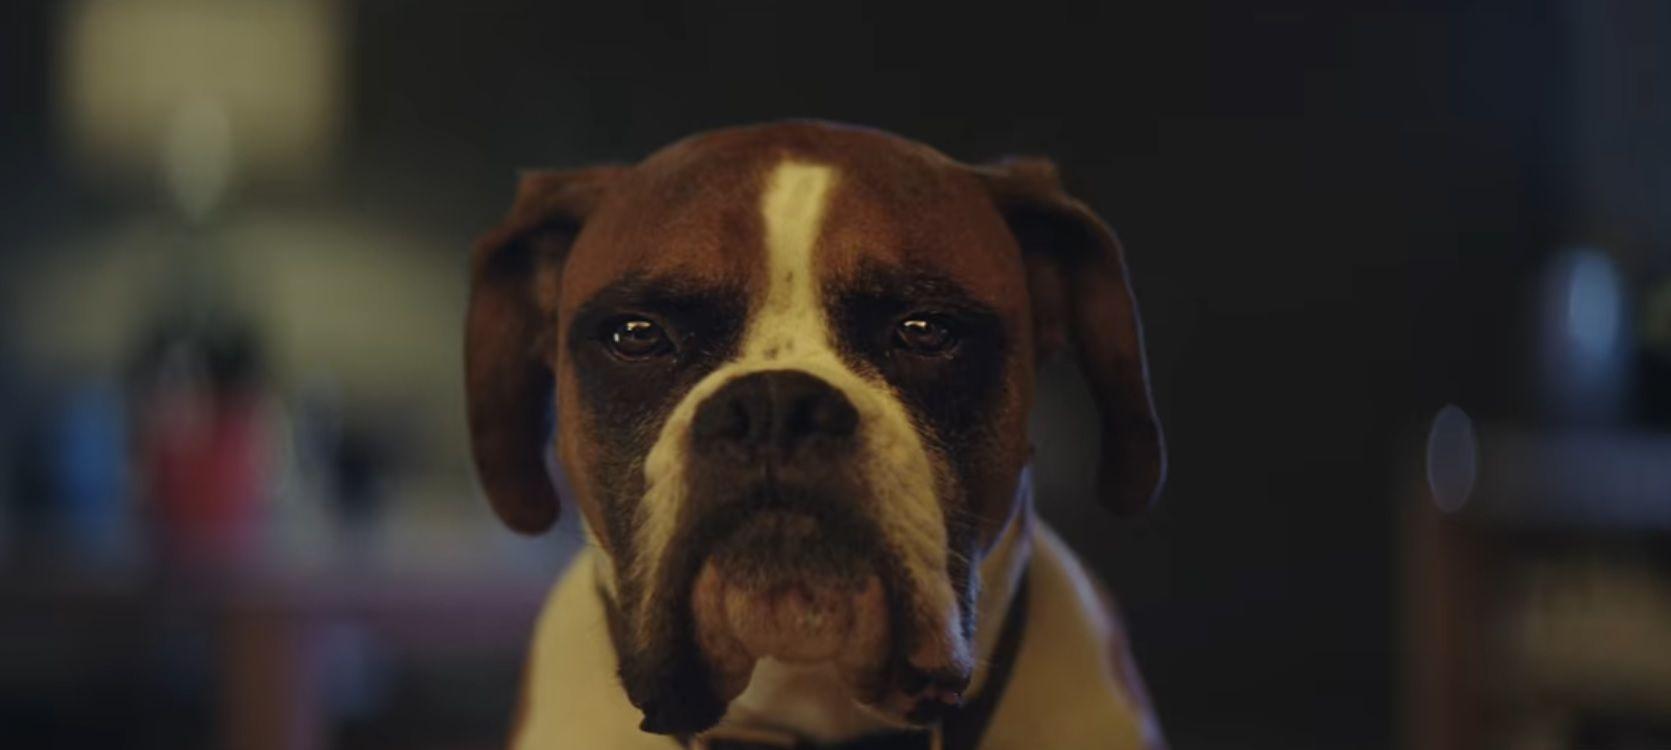 John Lewis Xmas advert 2016 - Buster the Boxer